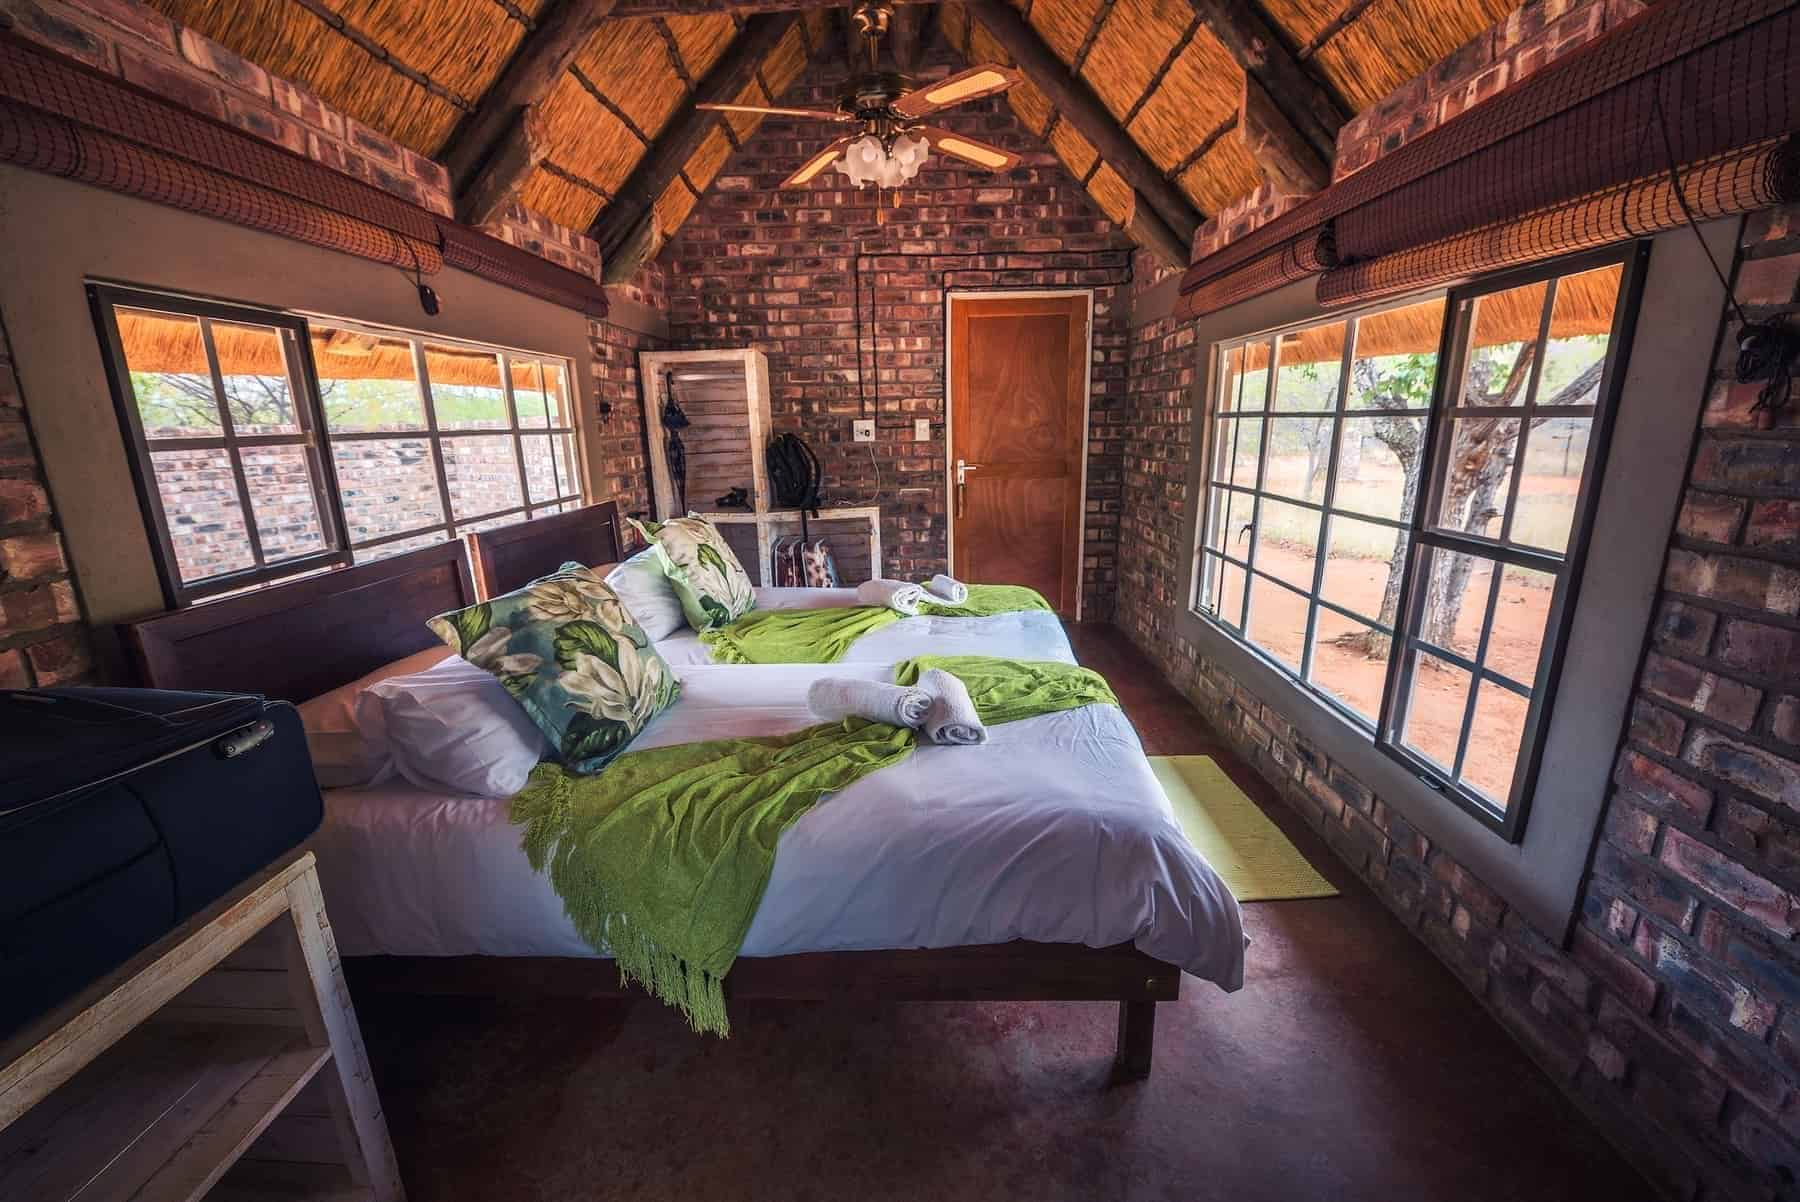 Chalet interior of the Kaoko Bush Lodge in Kamanjab. This desert lodge is located near the Galton Gate of Etosha National Park.